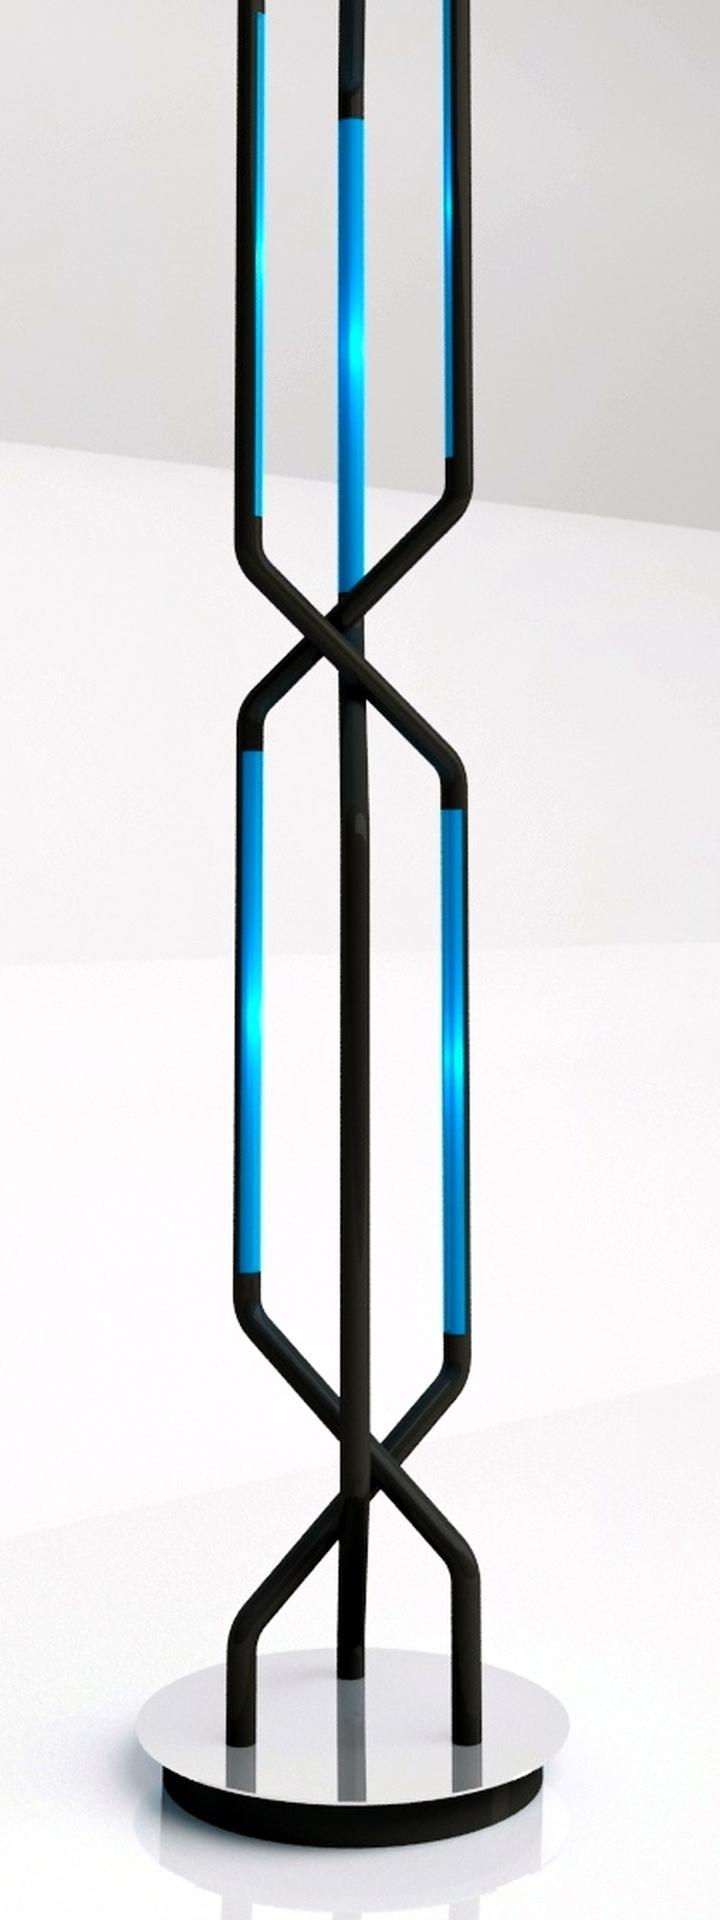 Roberto Pennetta sístole Noir y 1 bleu